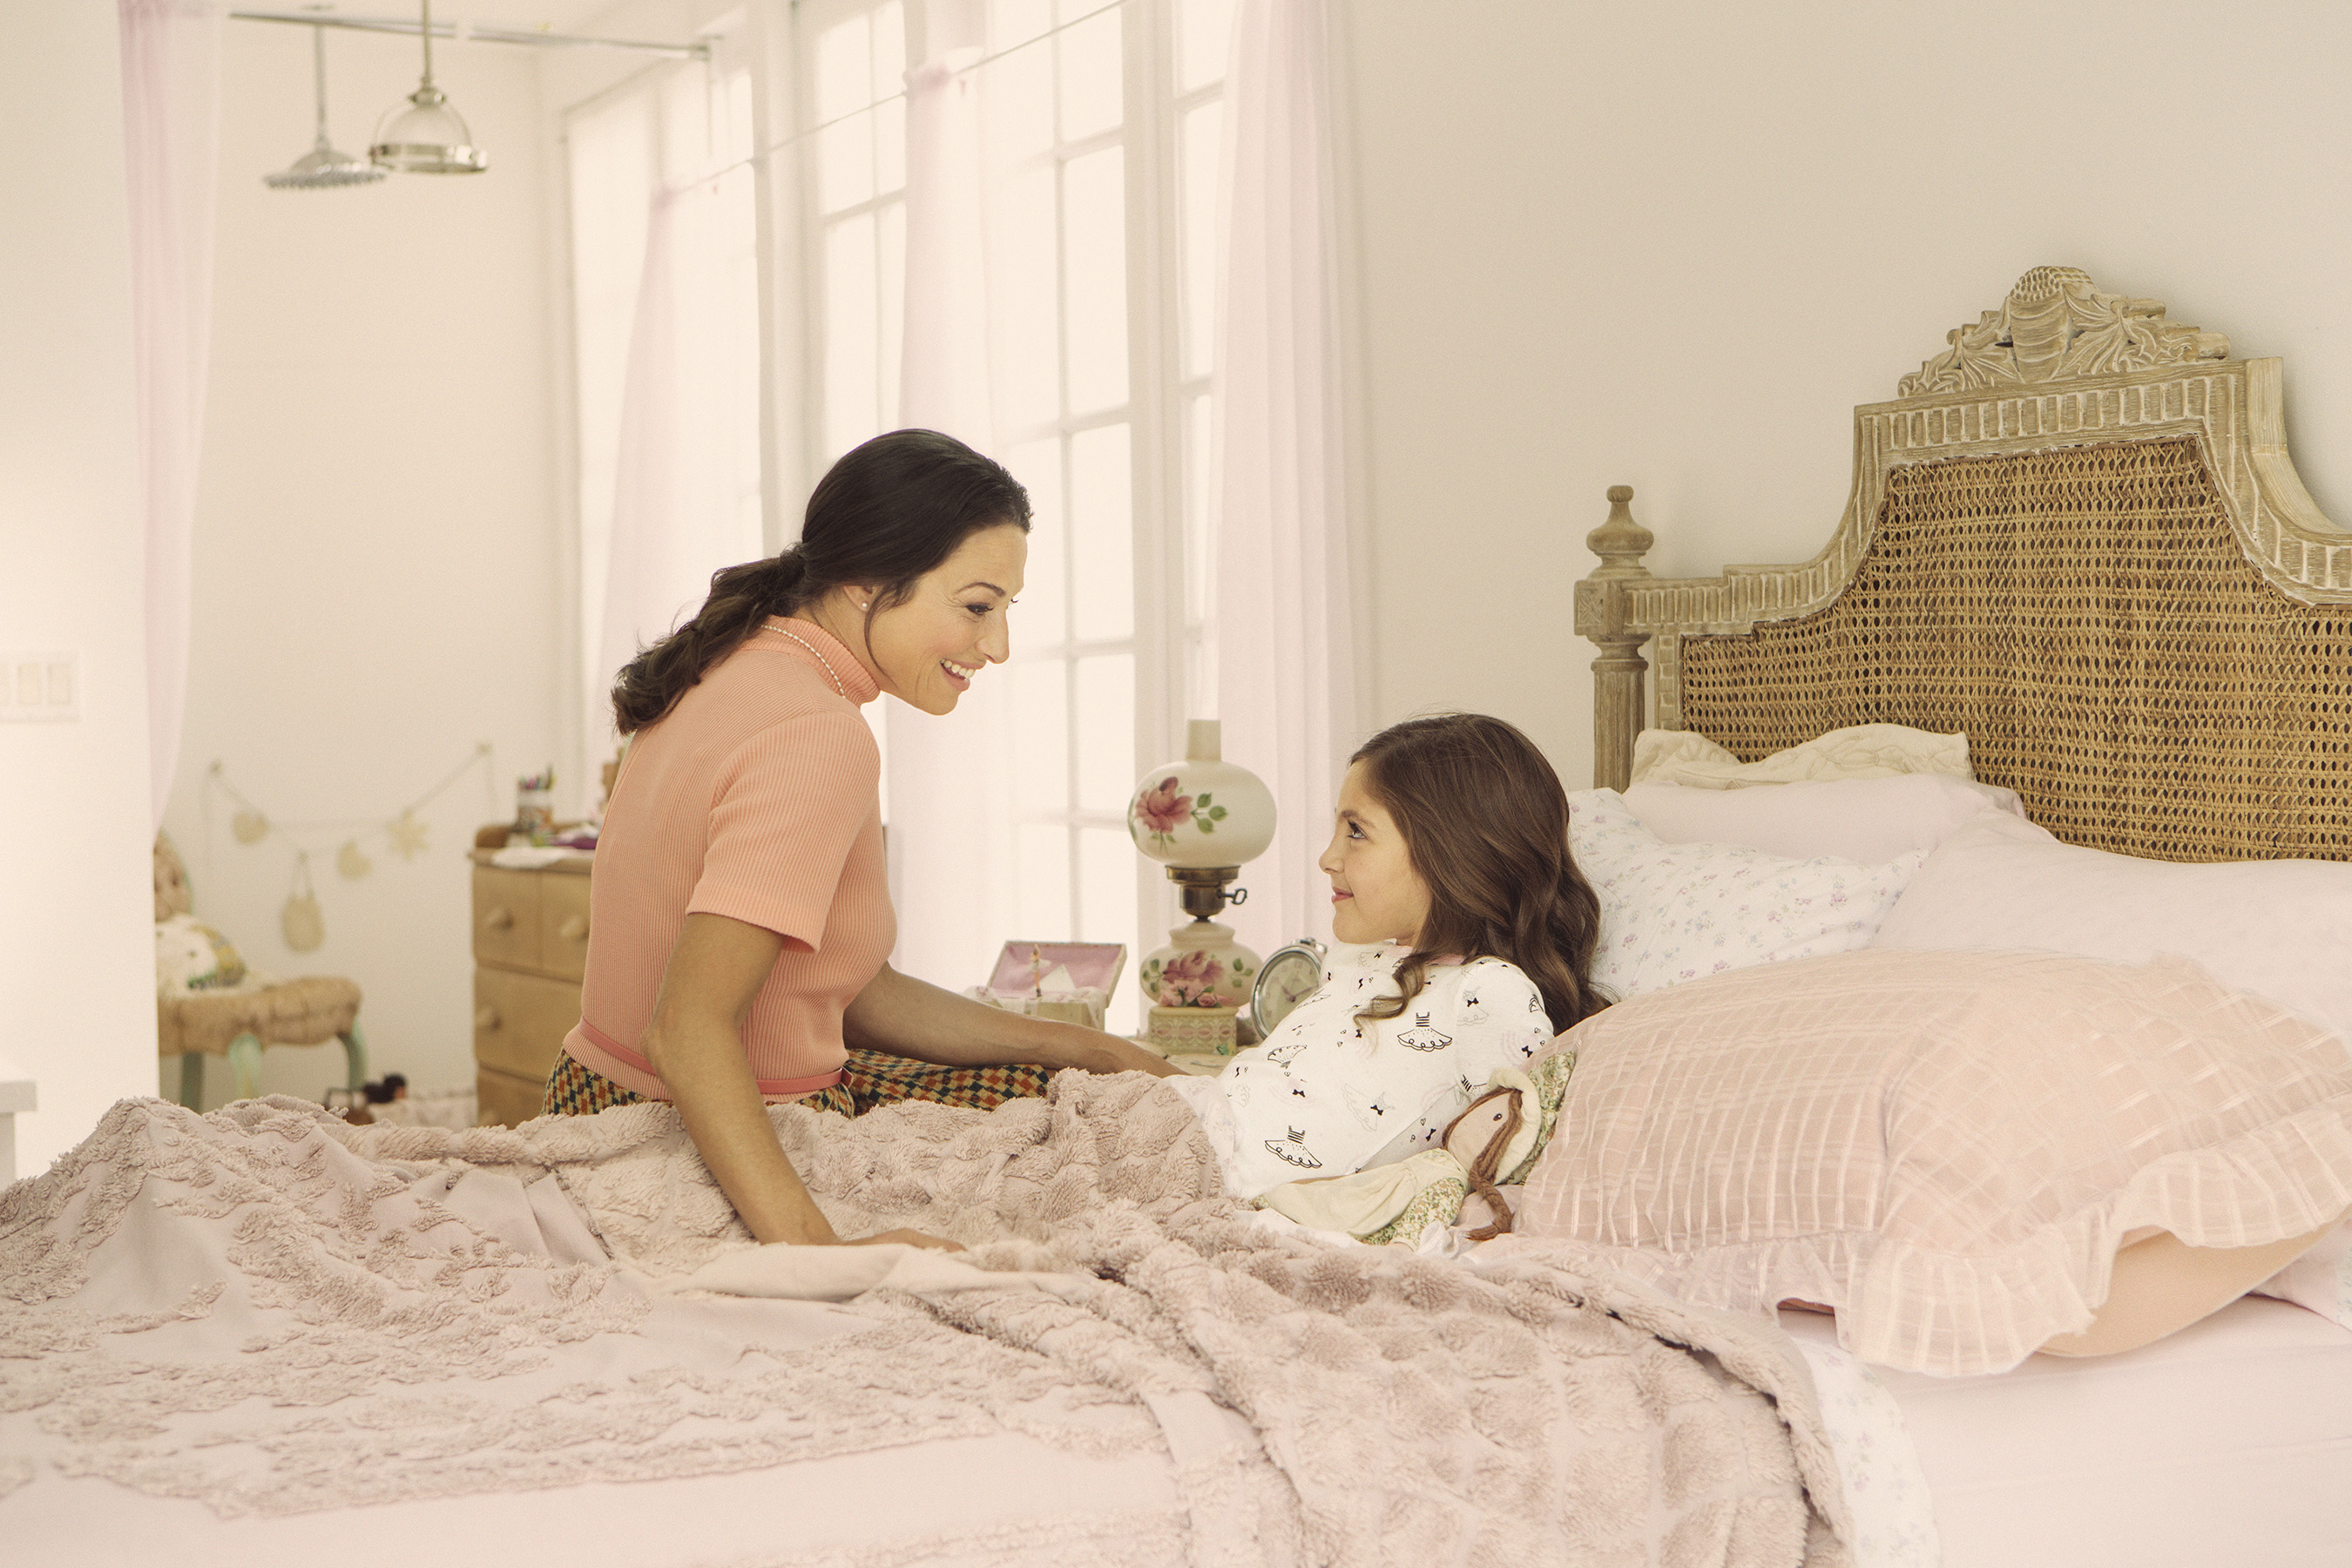 AARP Caregiver Identification Study